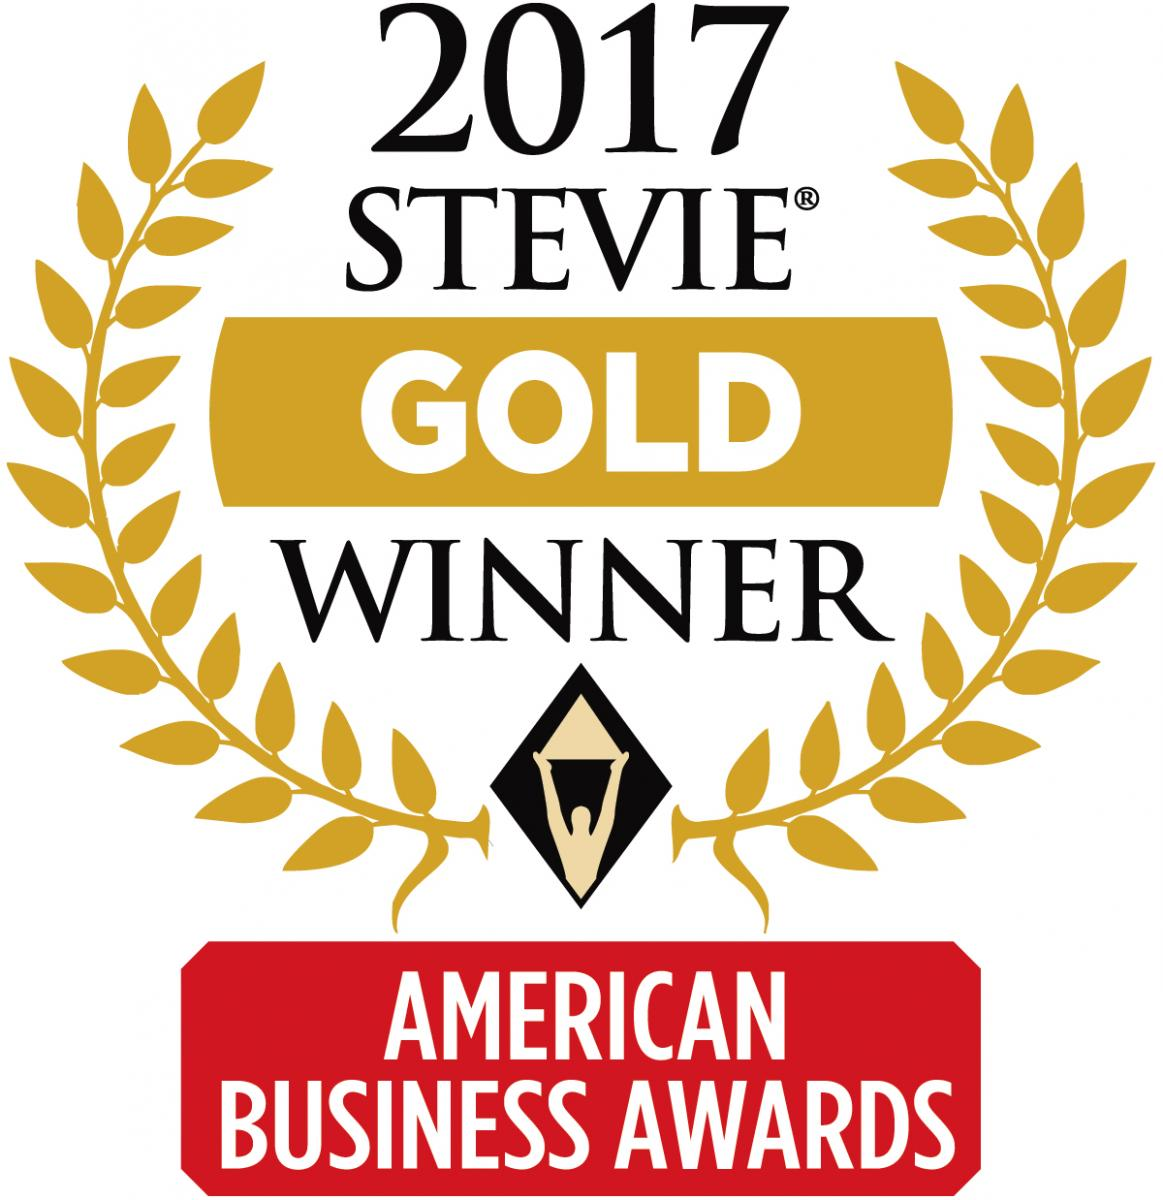 Mavenlink Recognized for Innovation with Multiple 2017 Stevie®Awards